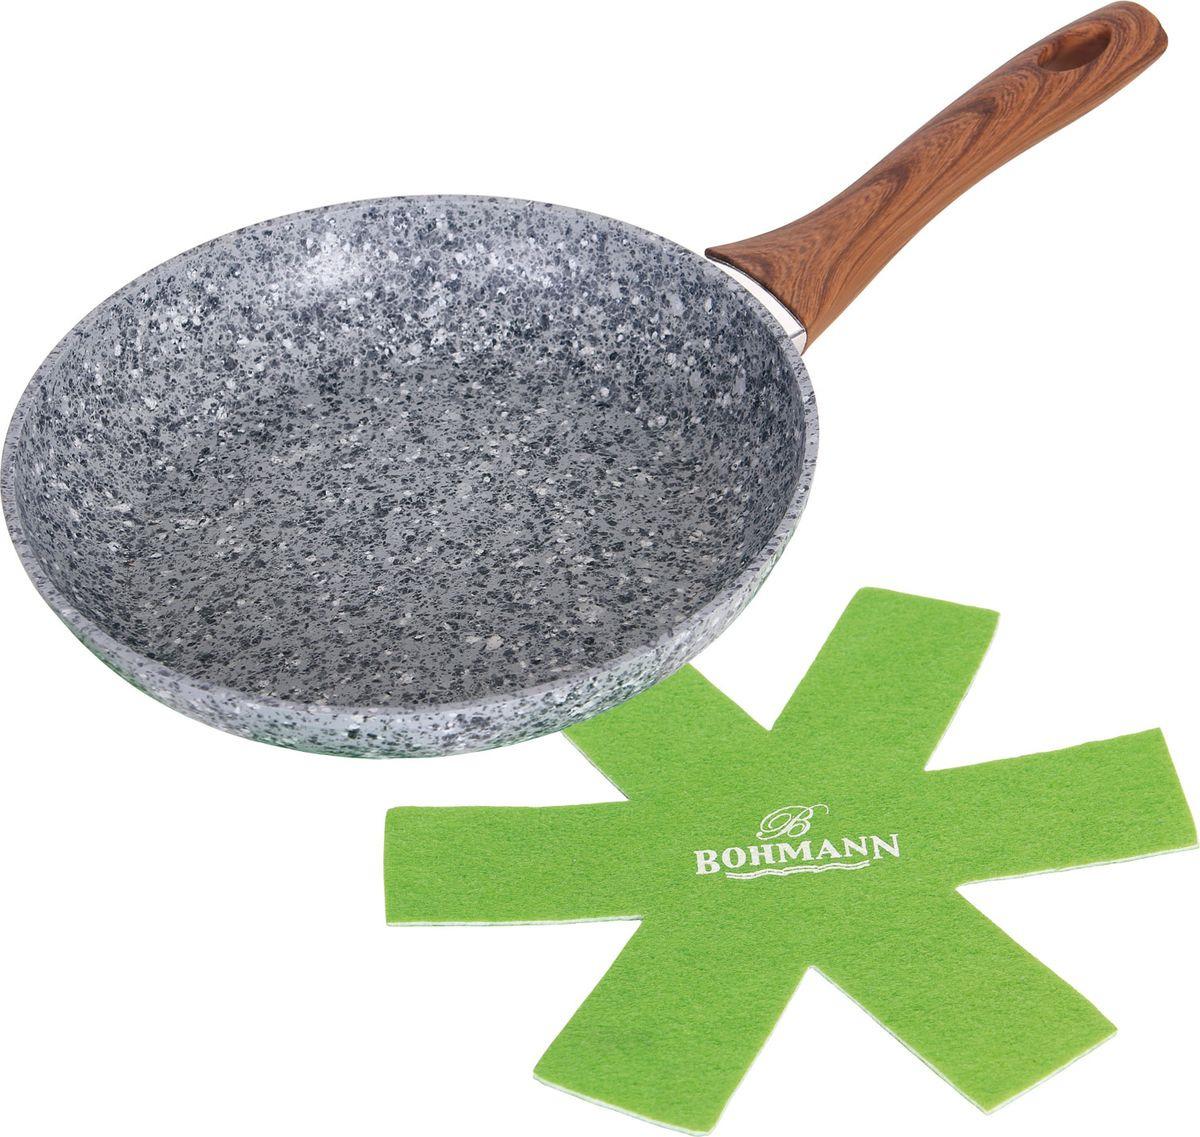 Сковорода Bohmann, с подставкой, цвет: серый. Диаметр 22 см. 1015-22BHGRN сковорода bohmann 372124вн серый диаметр 24 см